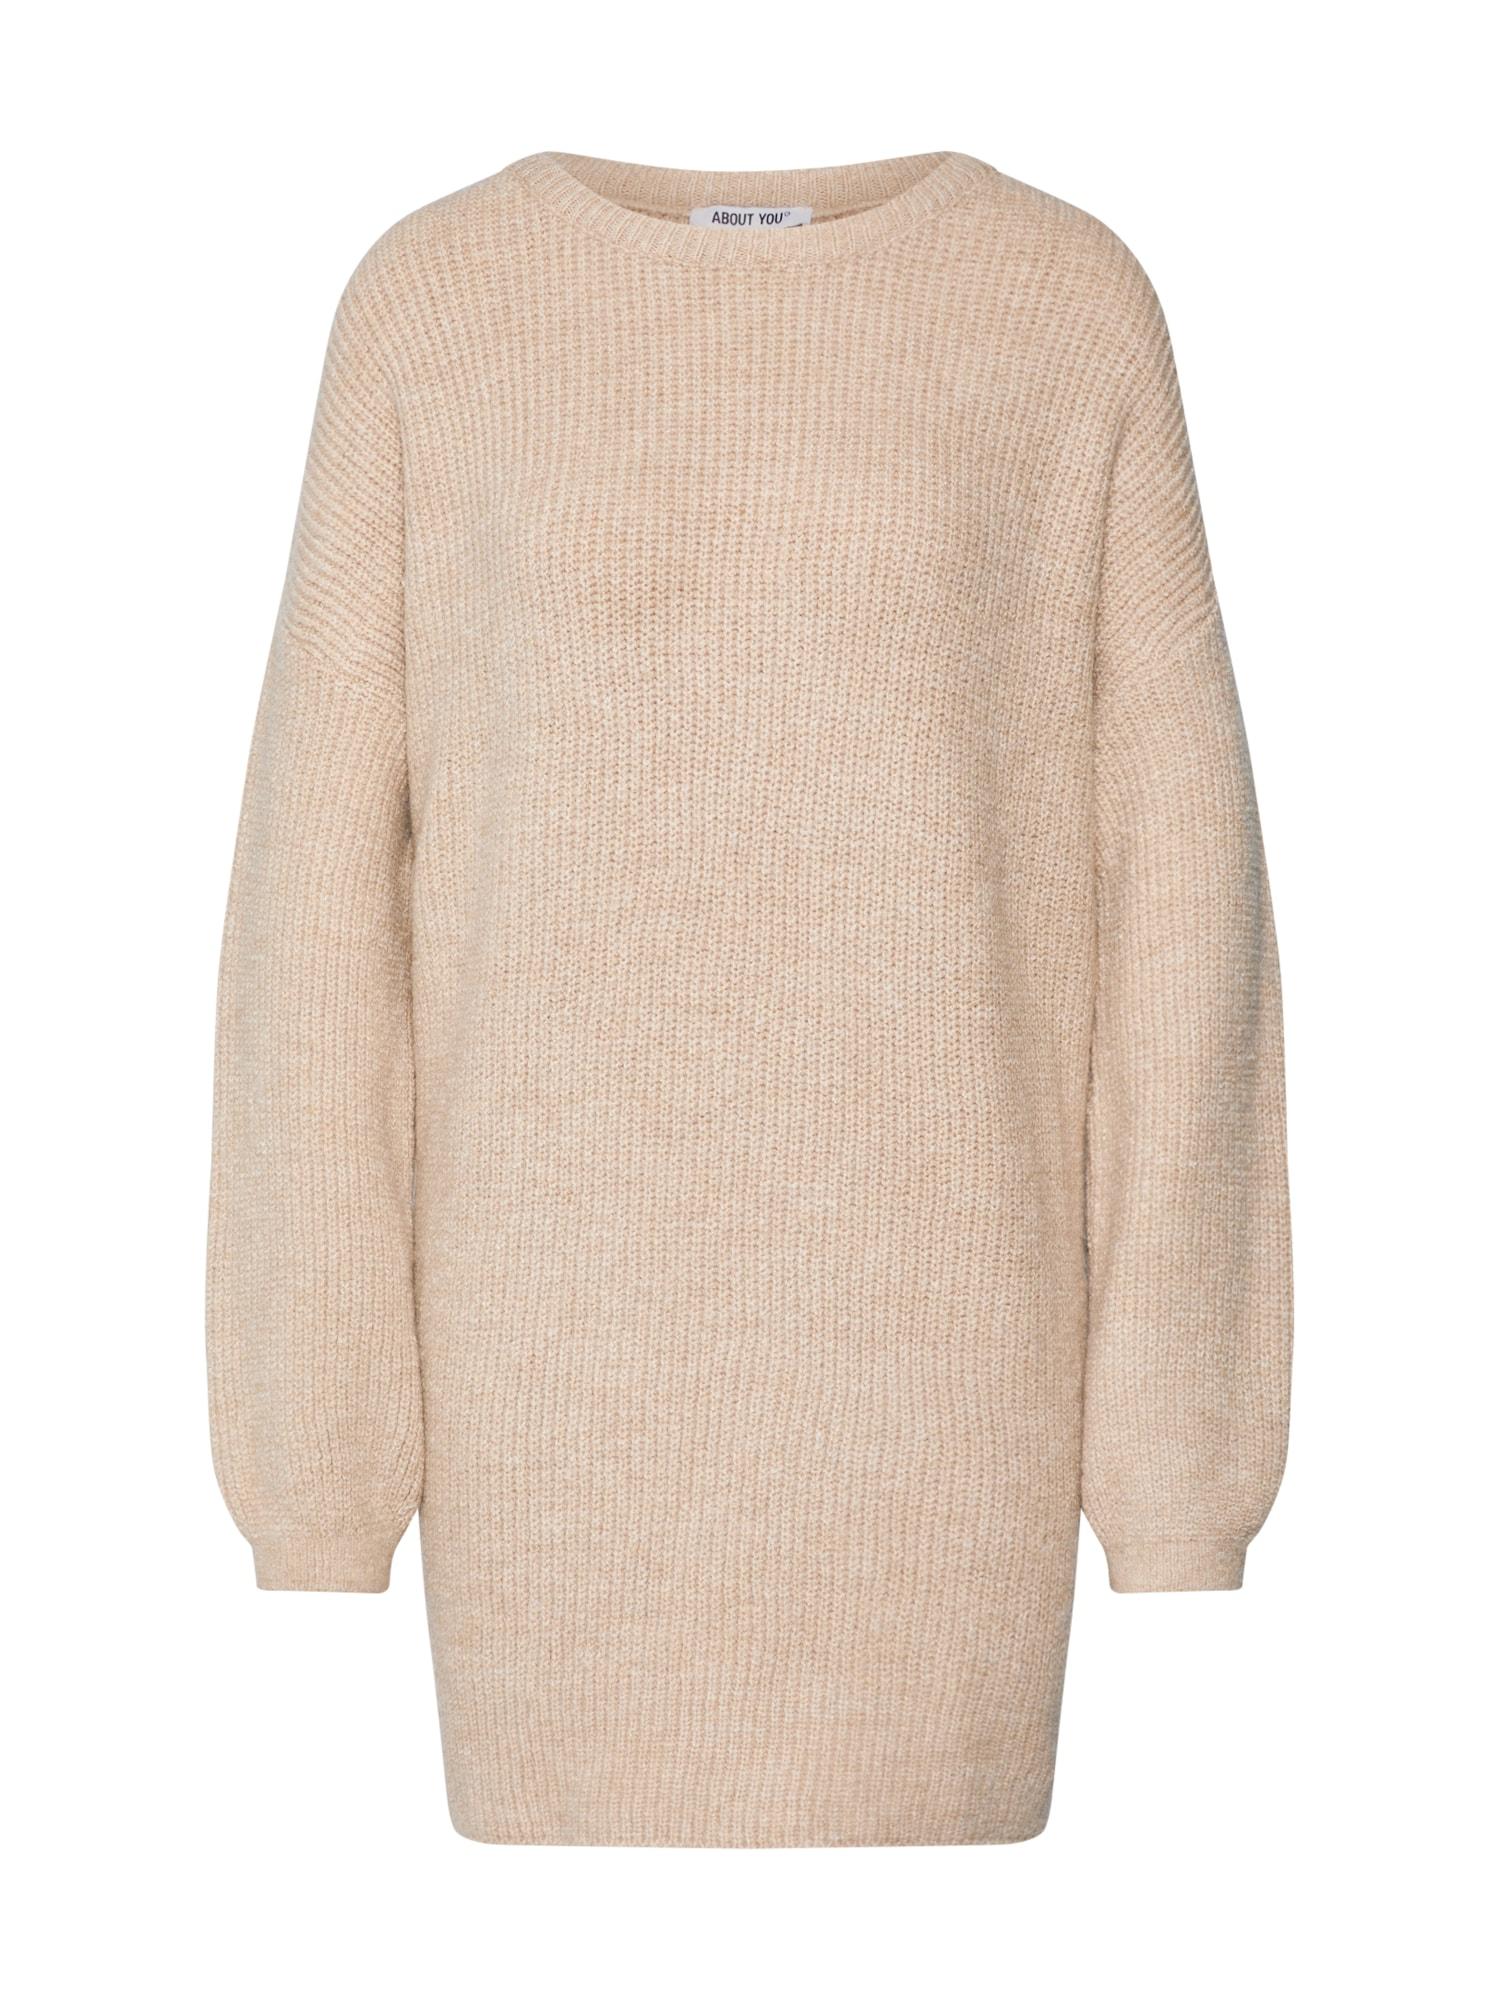 ABOUT YOU Laisvas megztinis 'Mina' smėlio